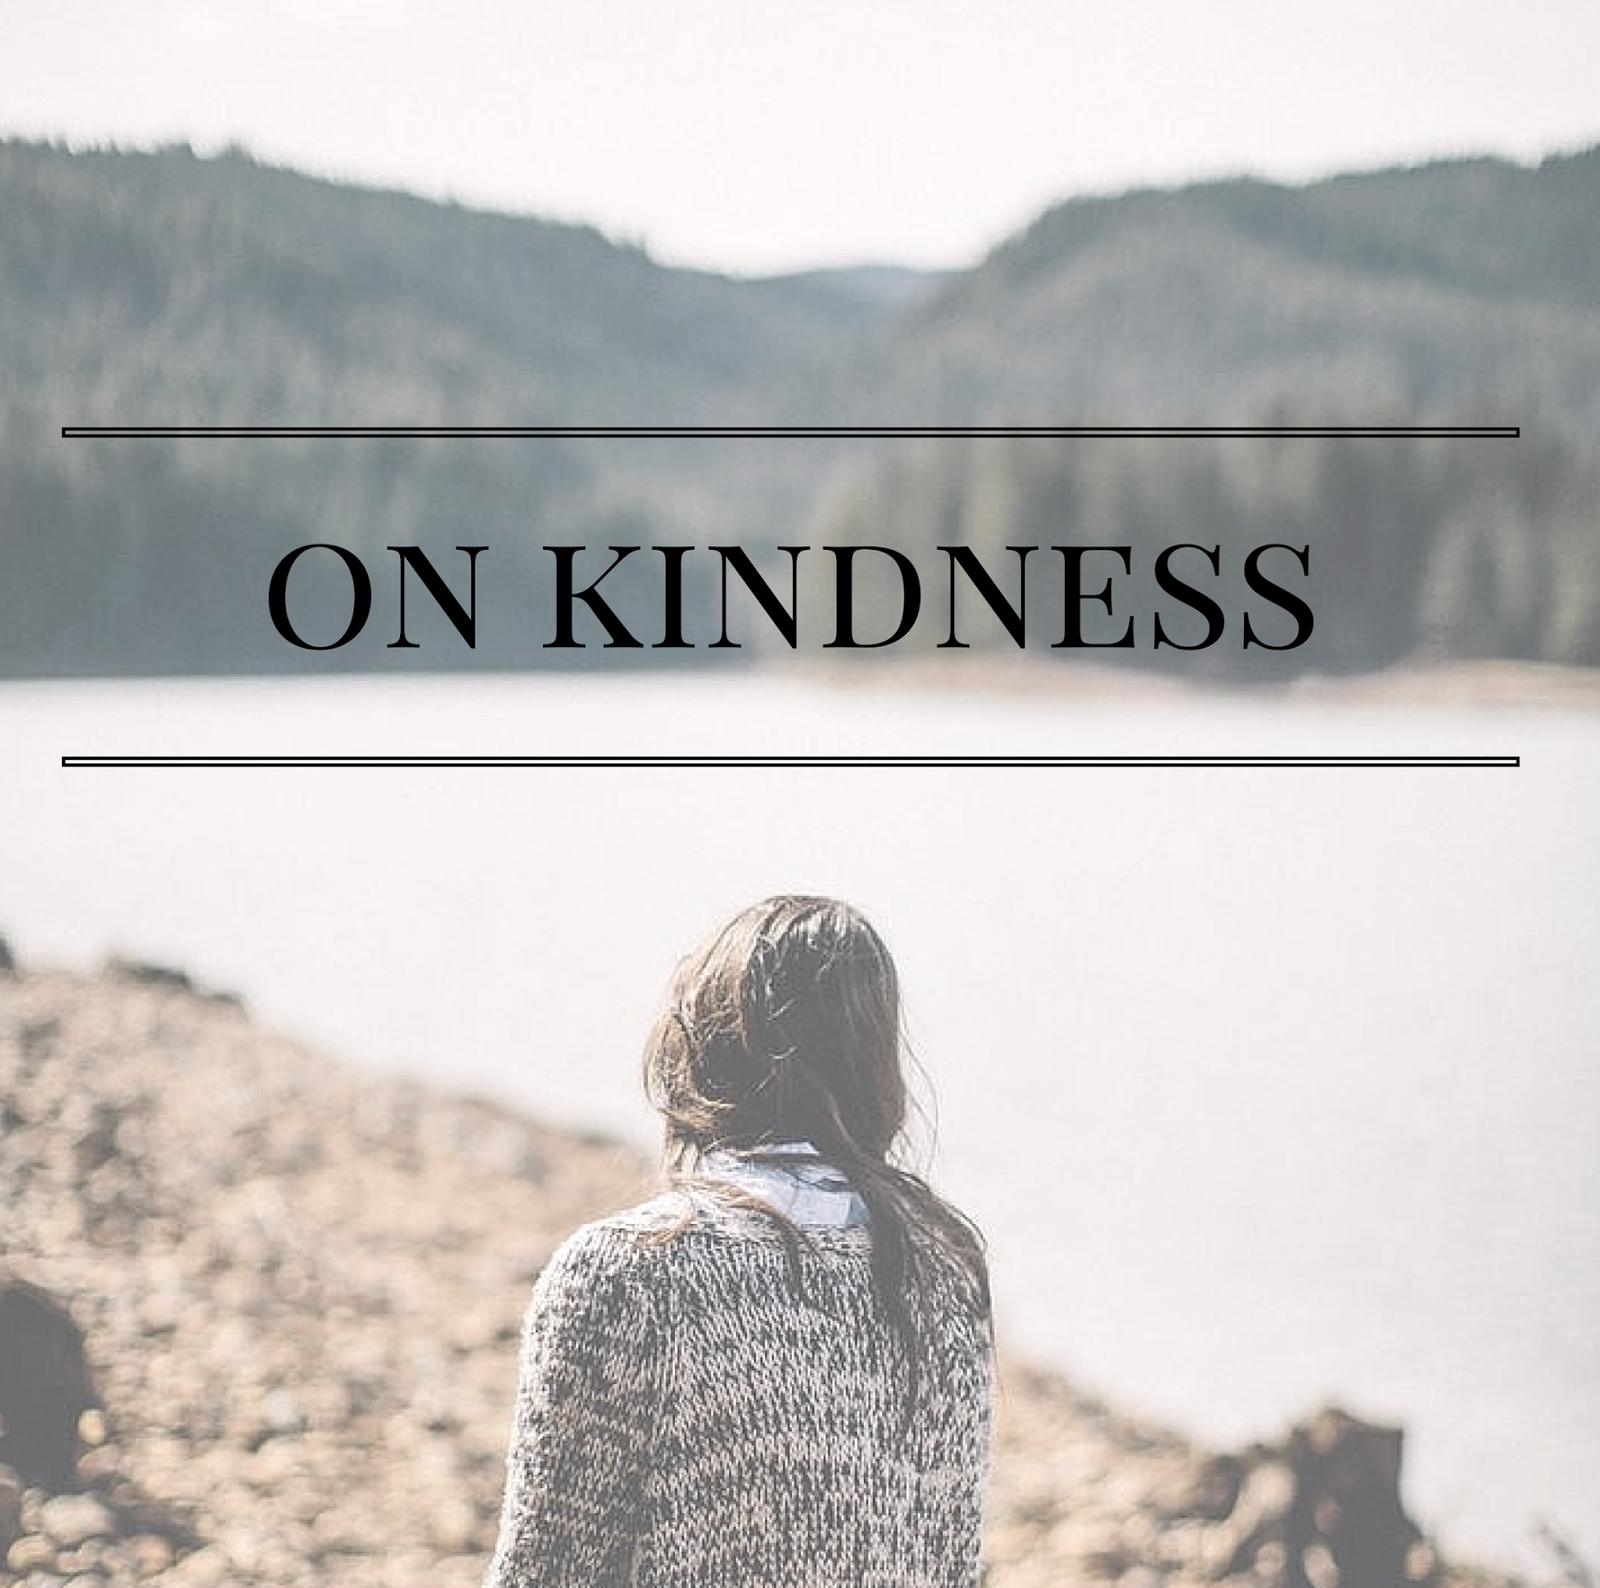 On Kindness | http://www.alyssajfreitas.com/2015/07/on-kindness.html